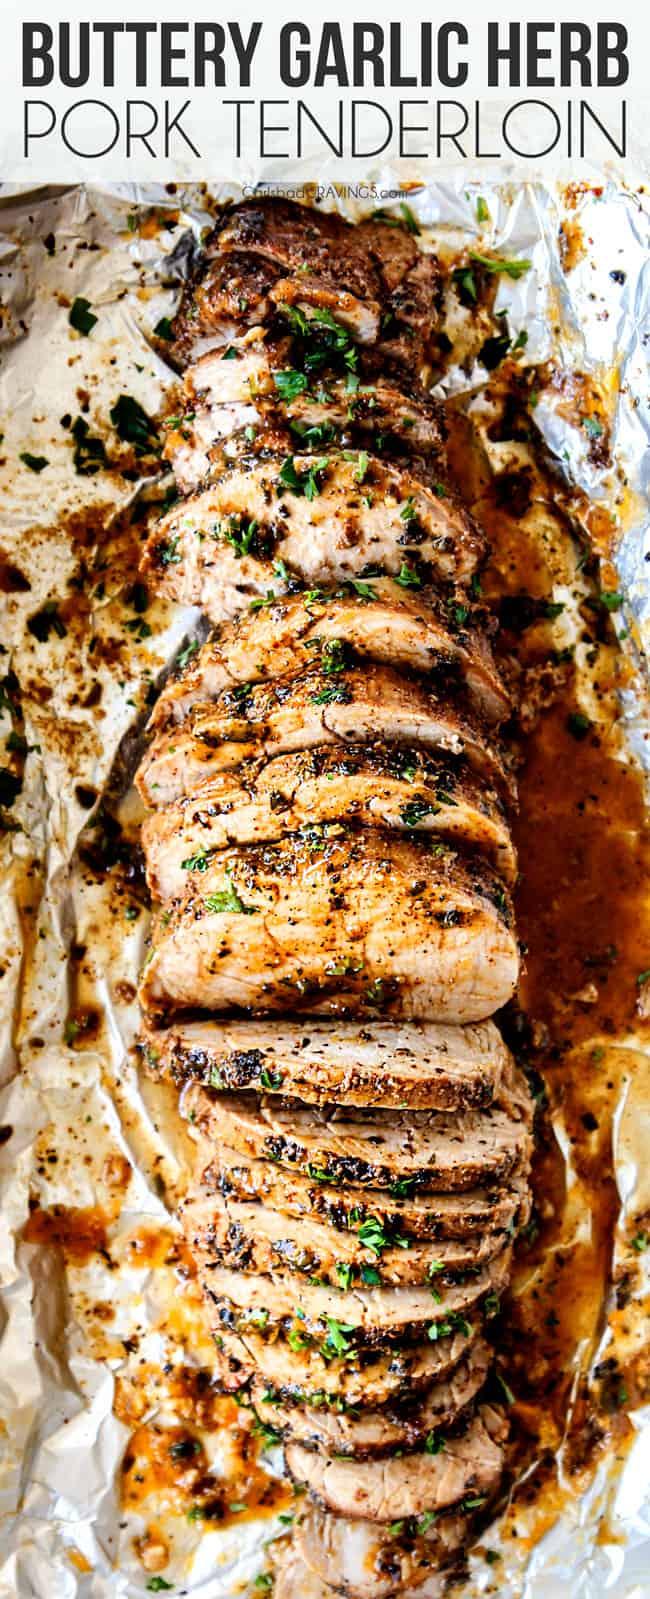 Best and Delicious Baked Pork Tenderloin